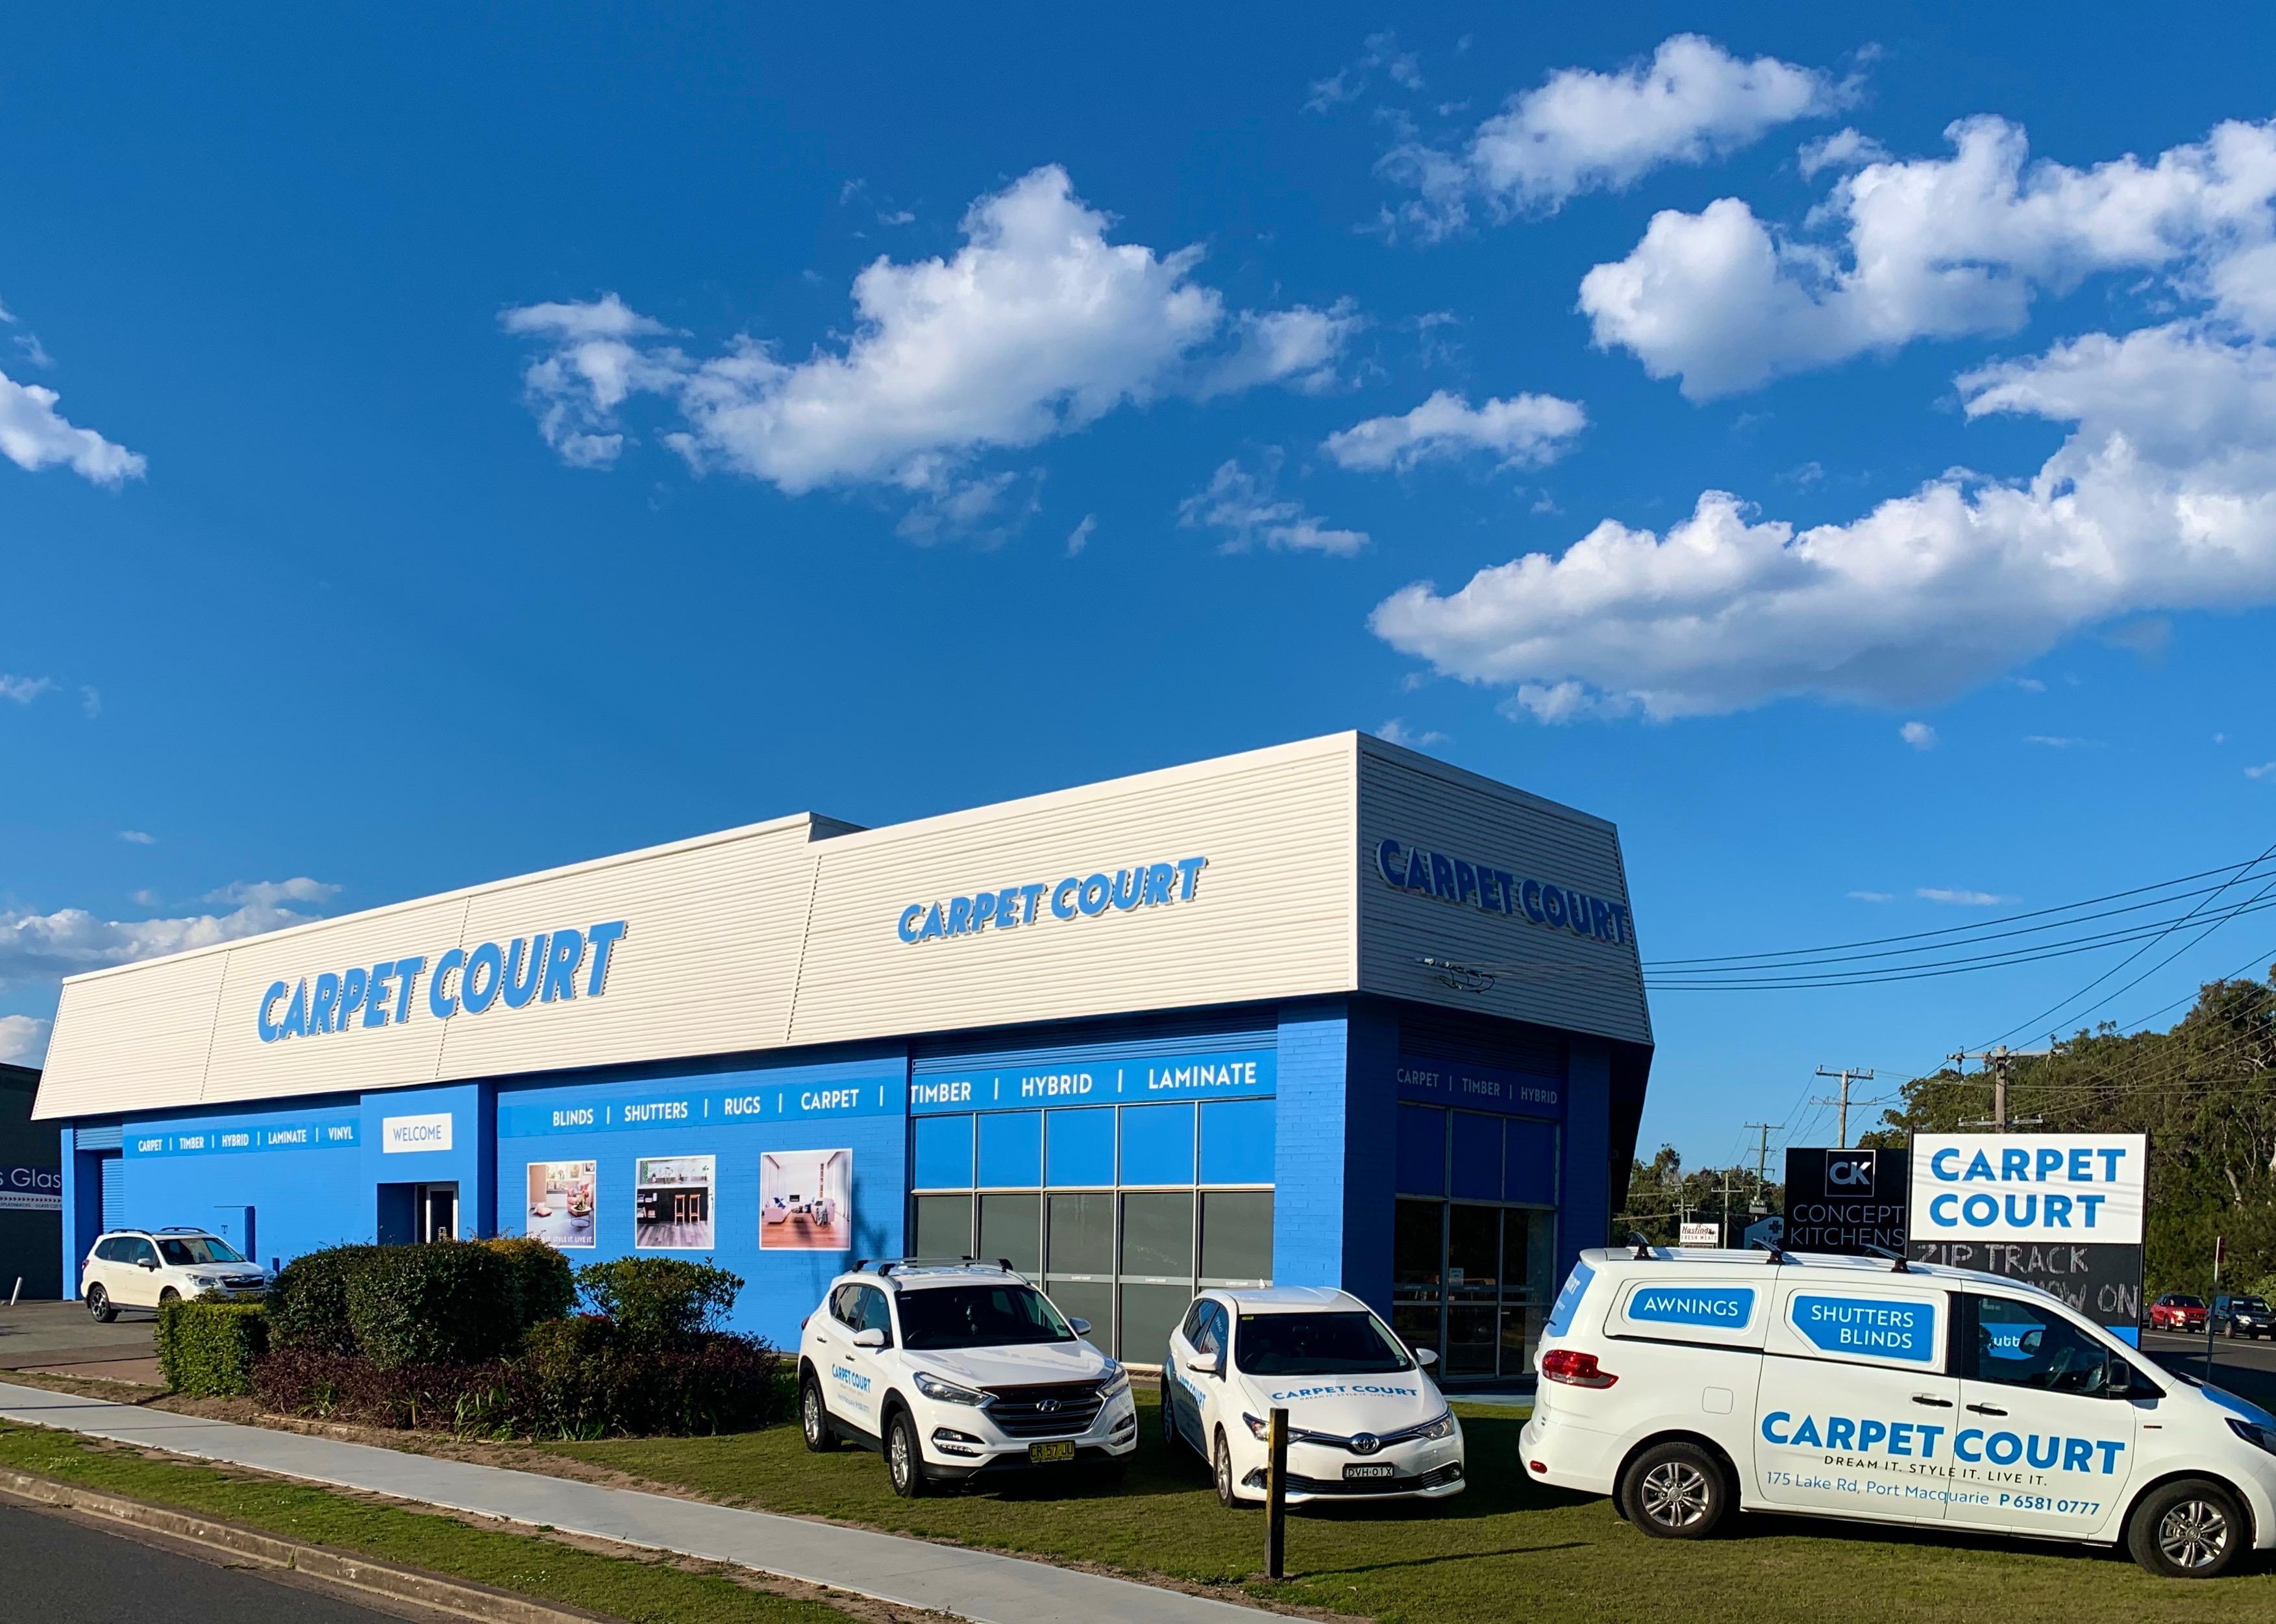 Port Macquarie Carpet Court